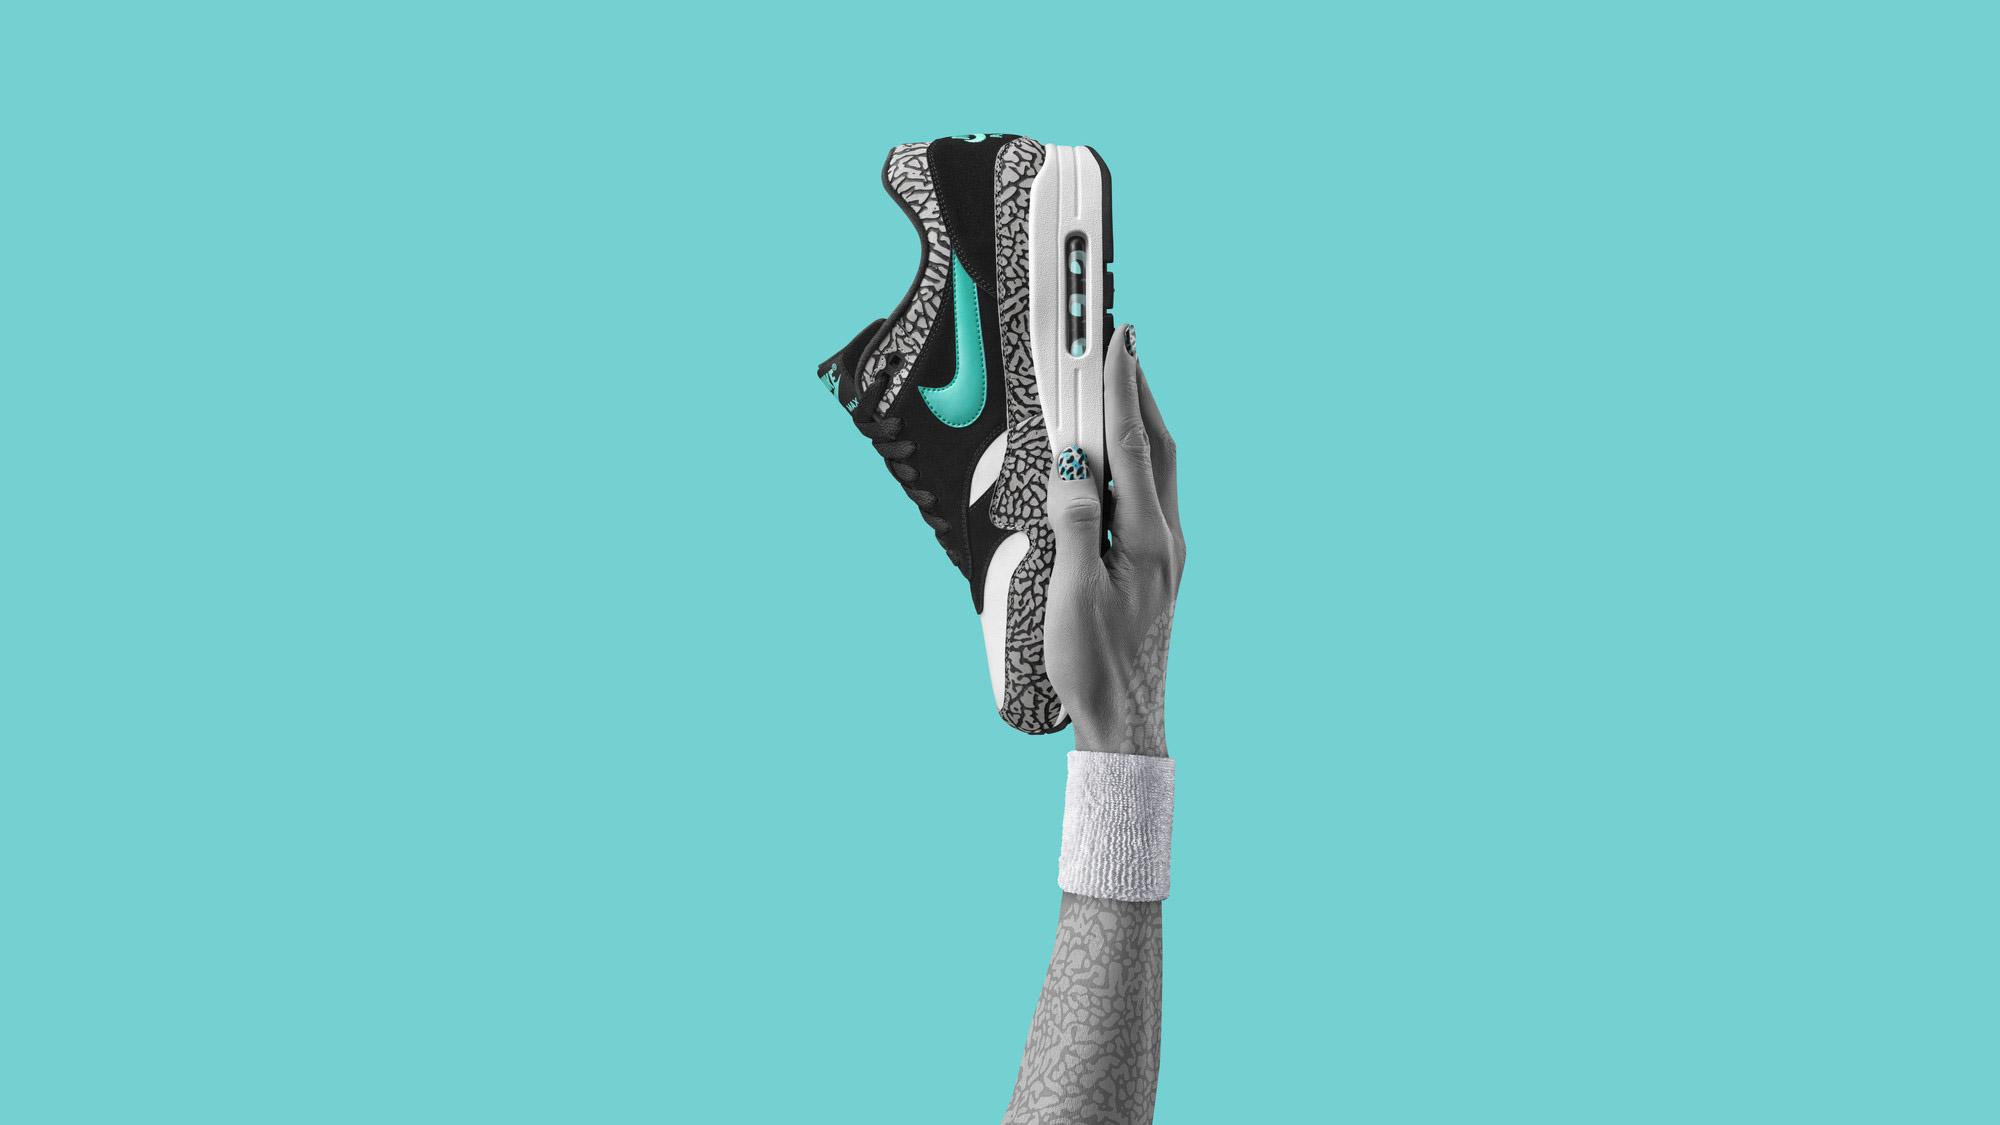 Nike Air Max Day 2017 9